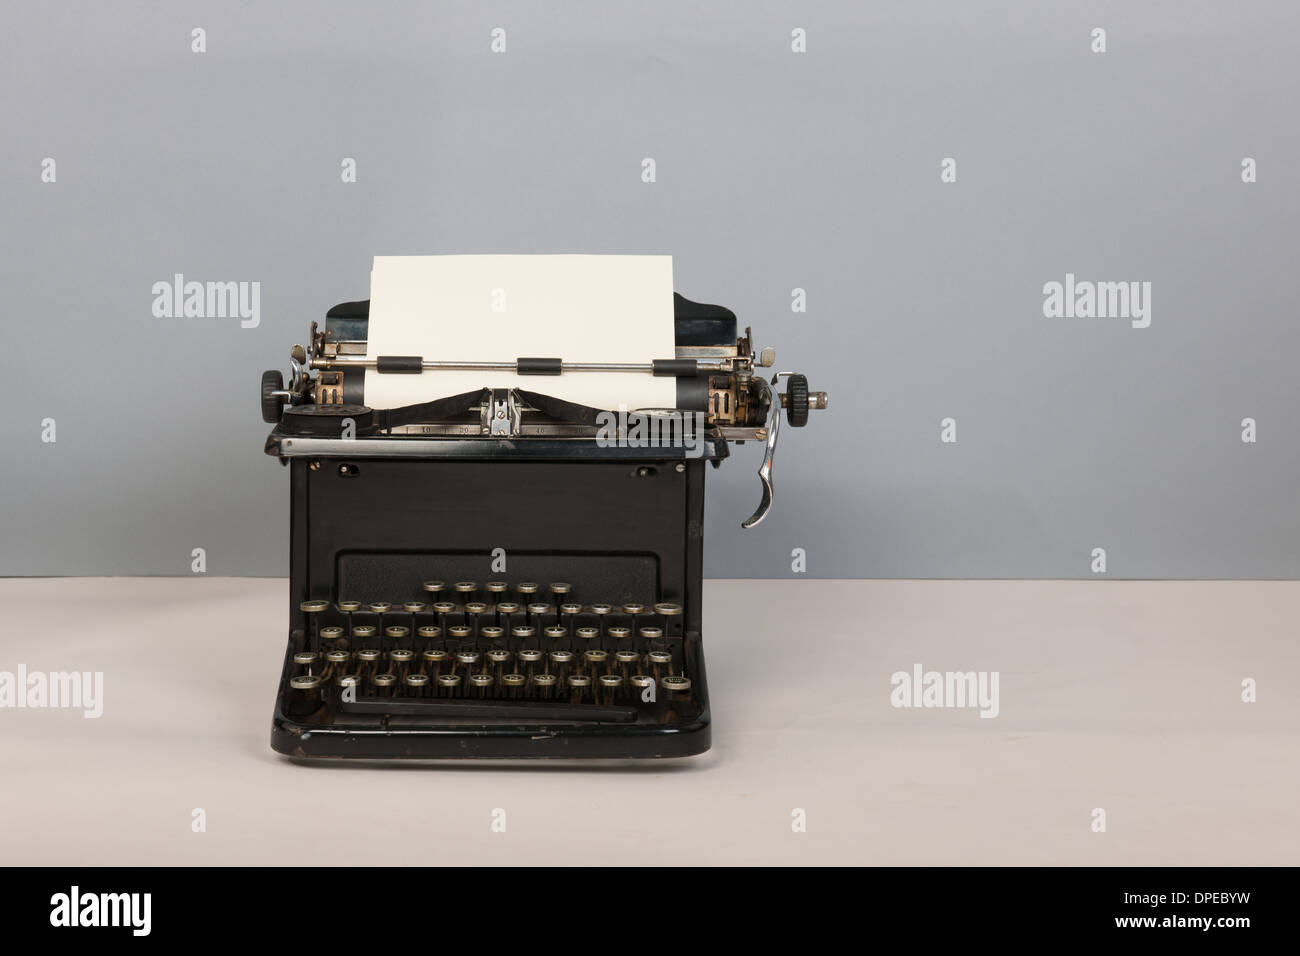 55a703cf536 Antique black typewriter on gray background Stock Photo: 65470269 ...